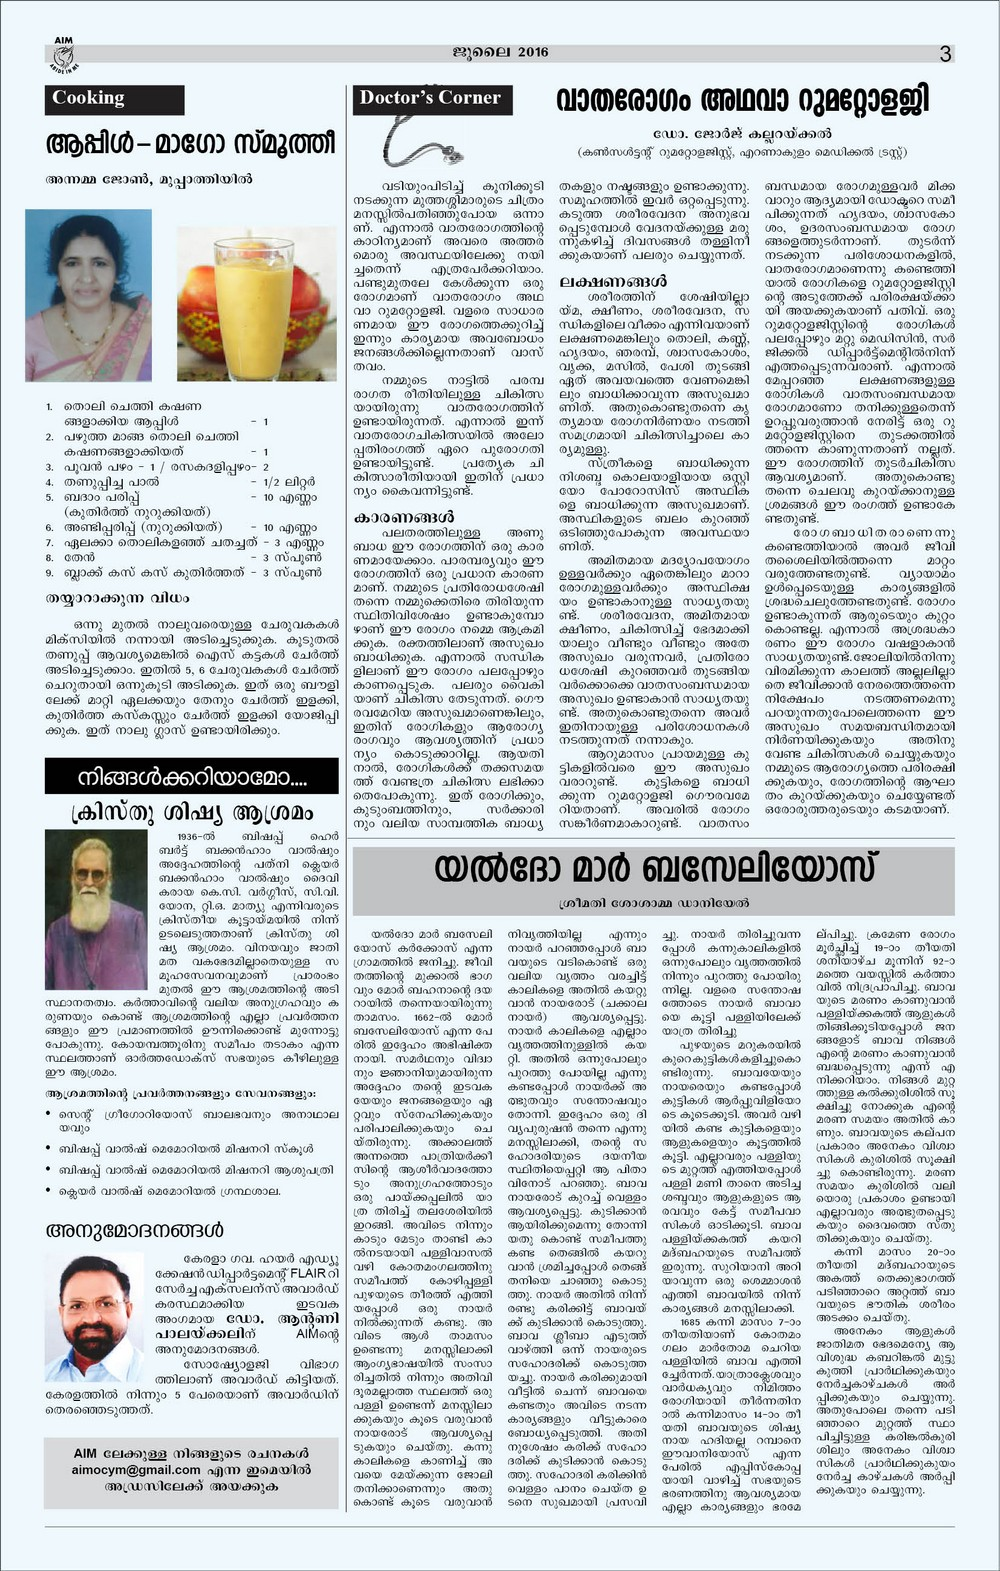 AIM JULY INTERNET EDN PAGE-3